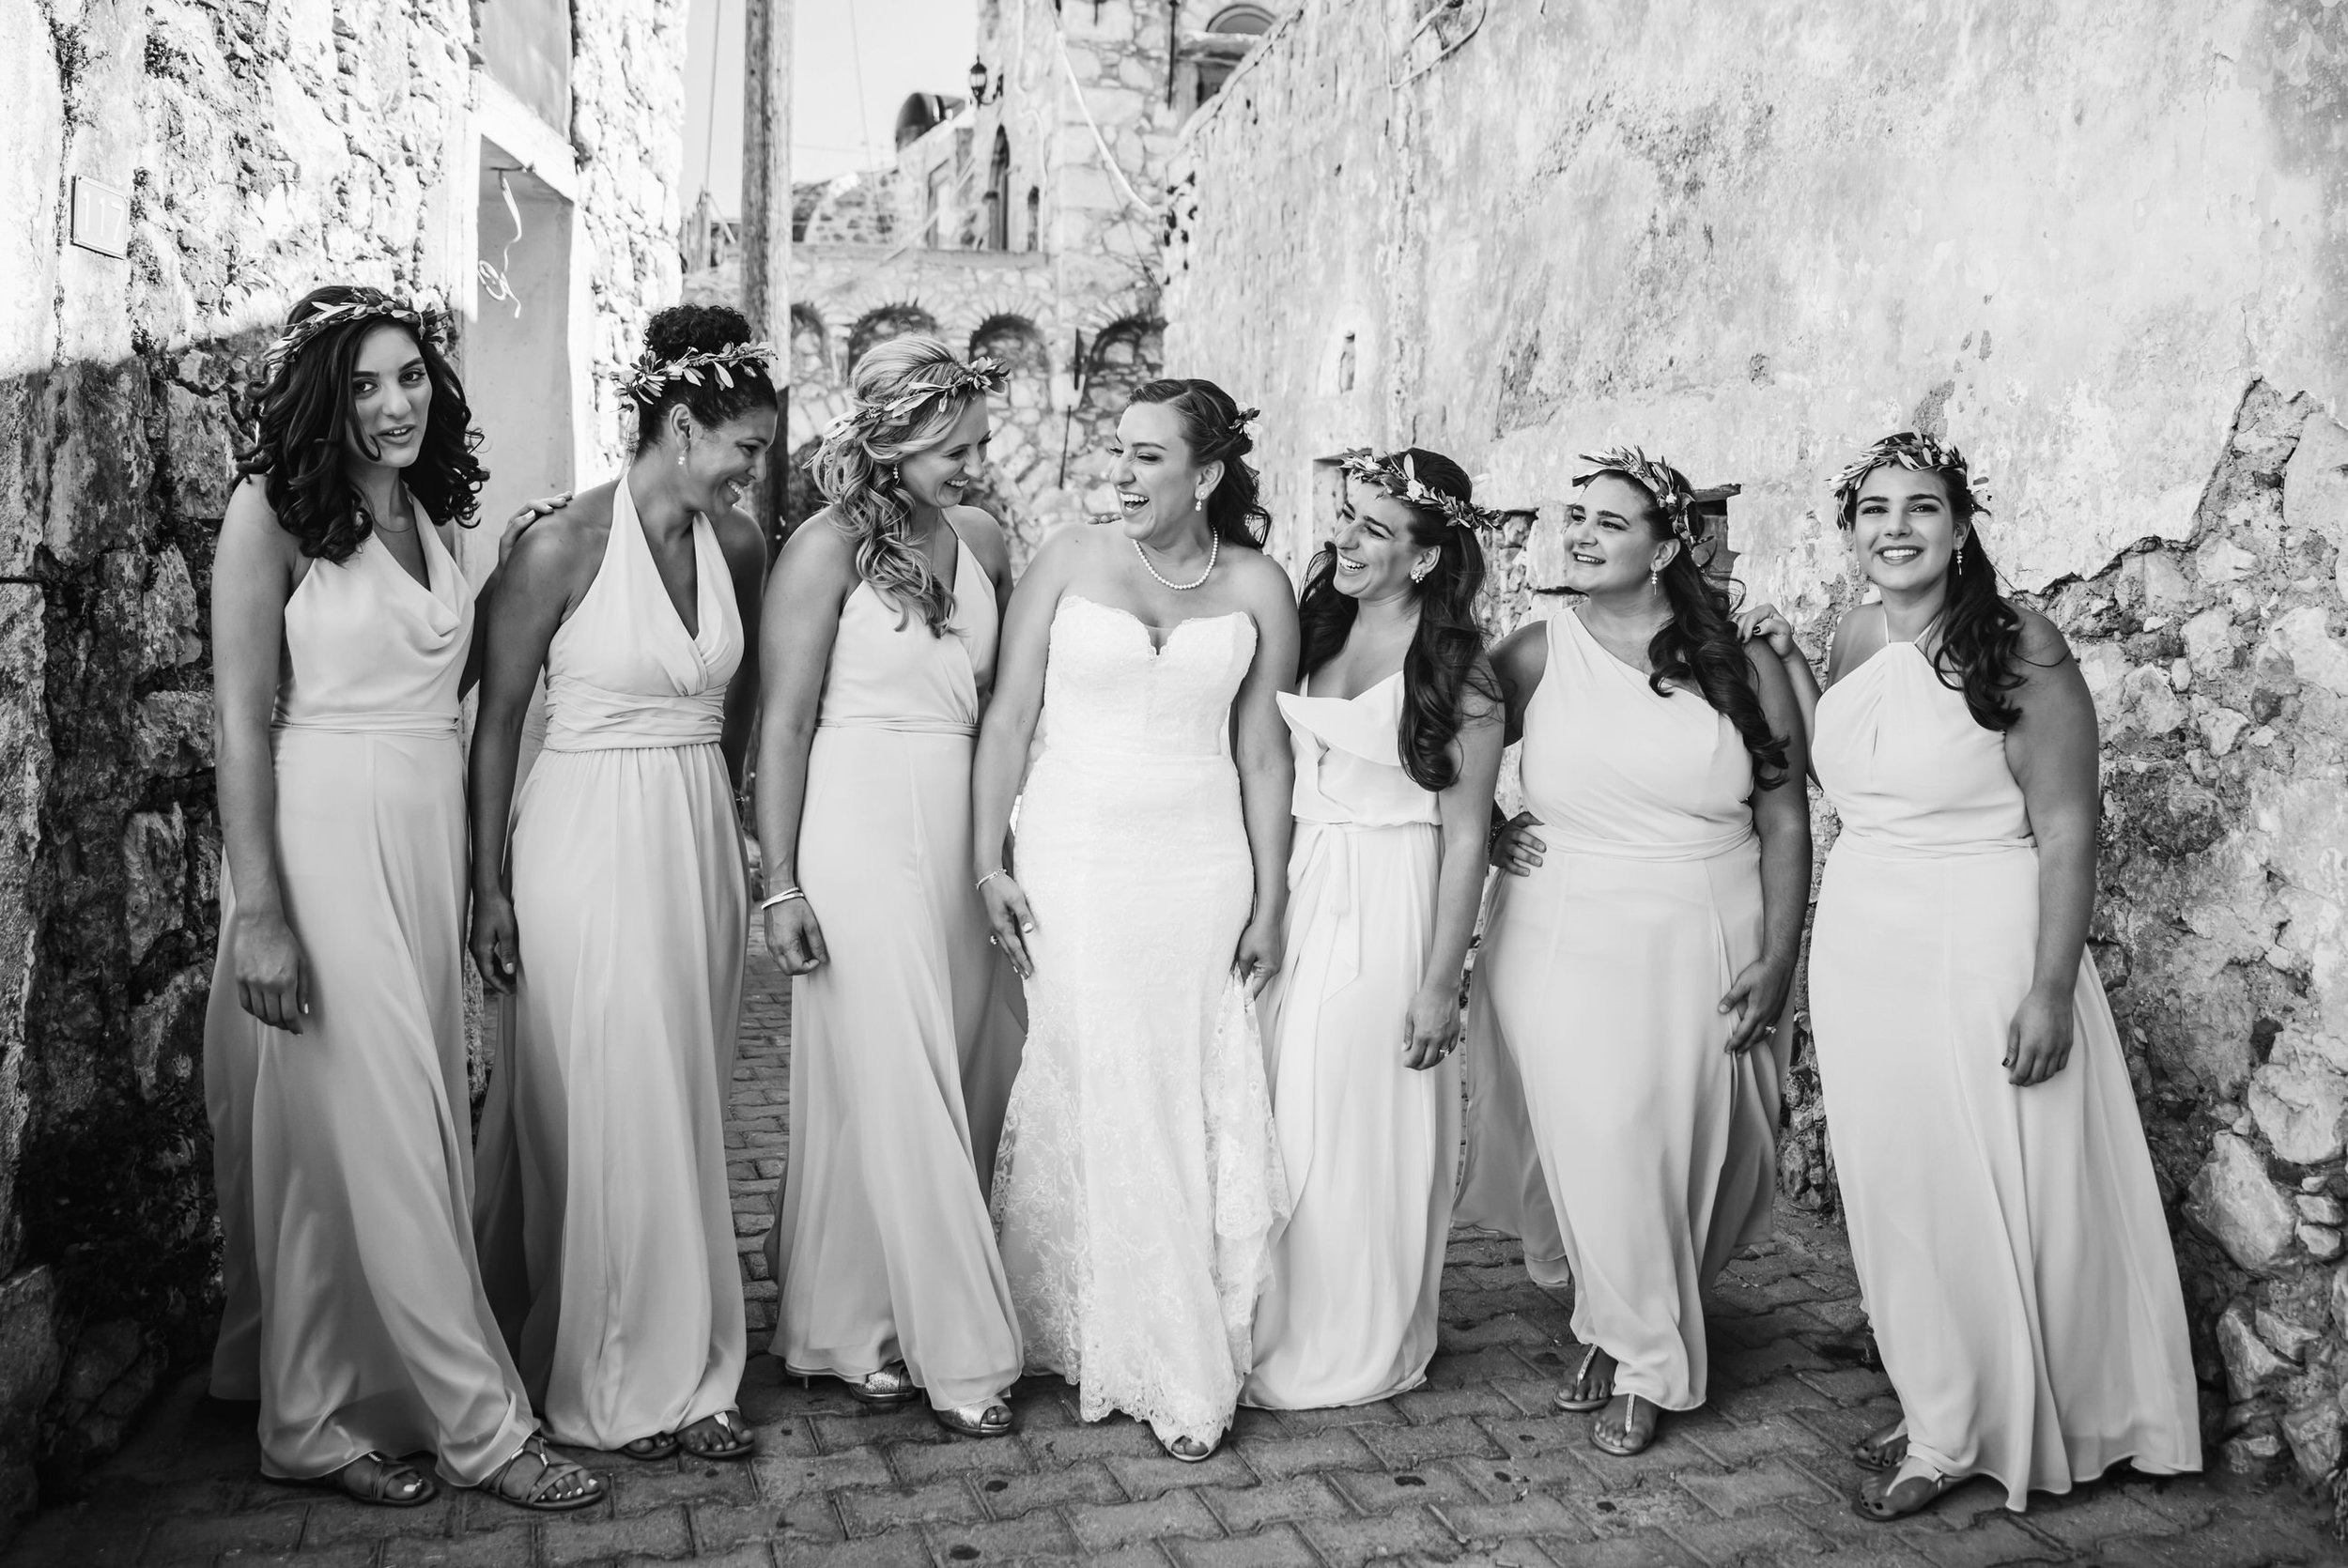 ChiosGreeceWedding-Trisha&Will-WeddingParty-Family-18.jpg